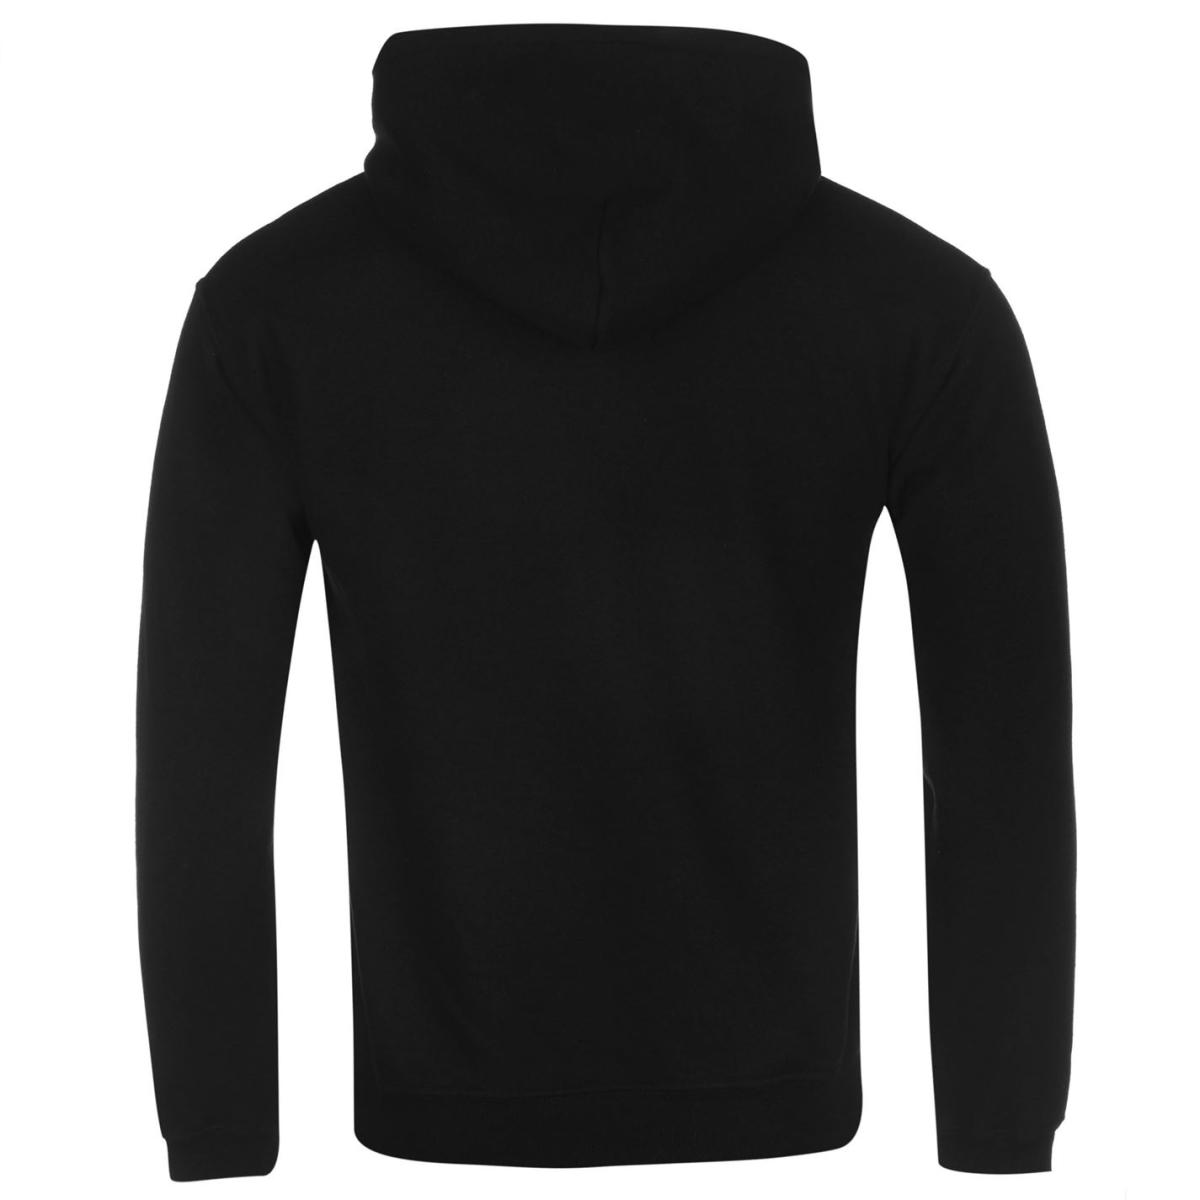 Pantera Kapuzenpullover Kapuzenjacke Hoodie Herren Sport Sweatshirt 57